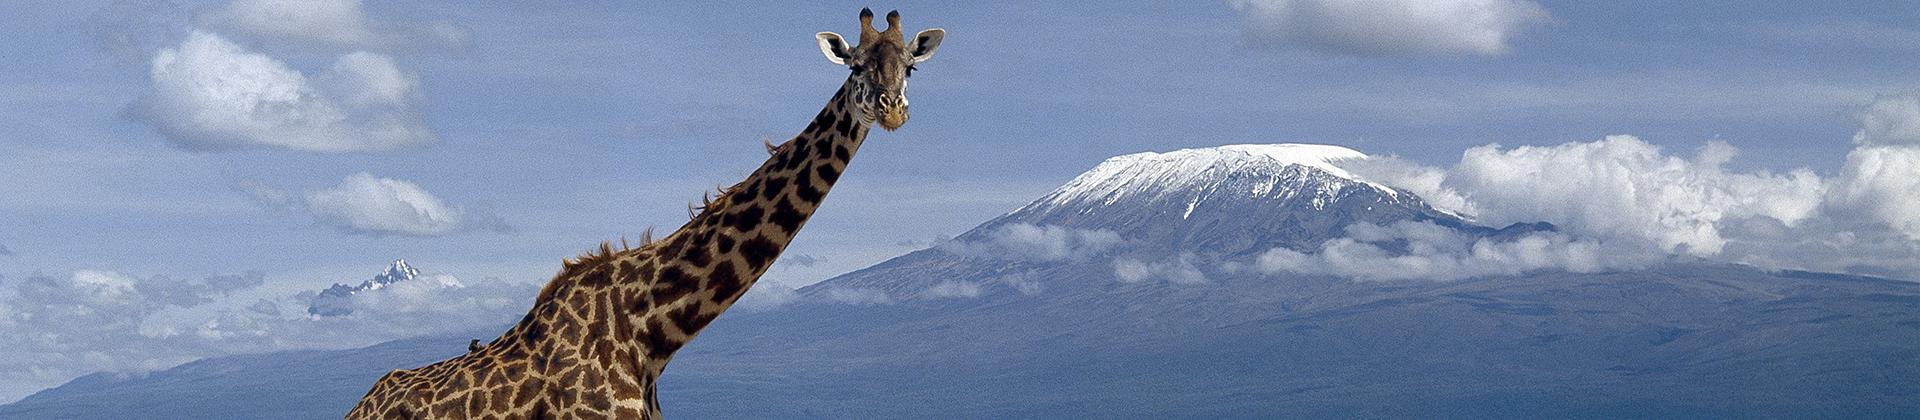 Kenya Eastern Africa